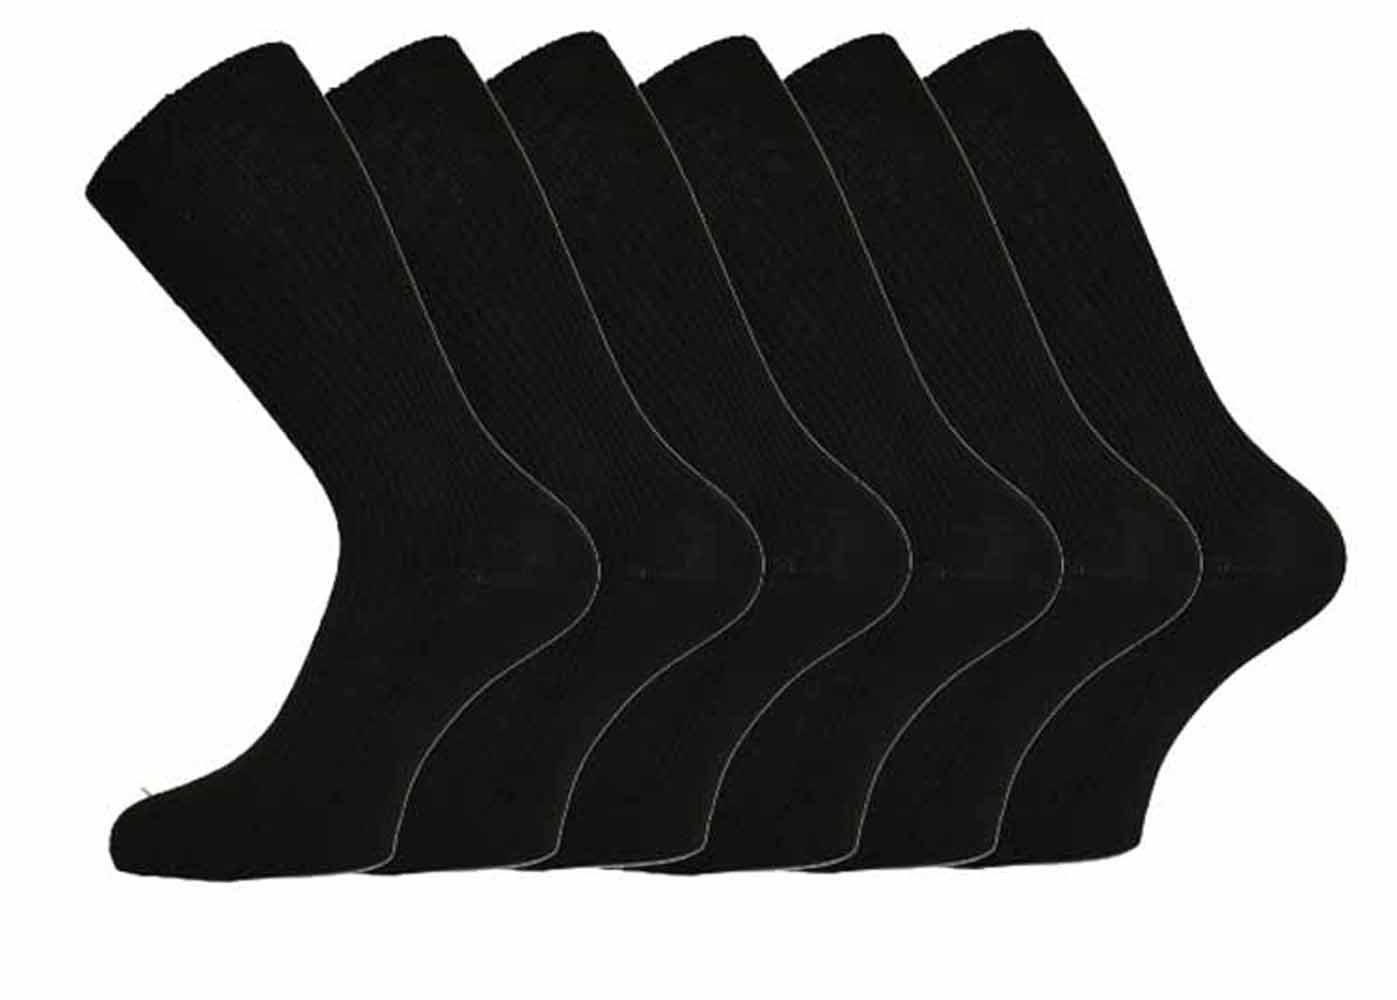 Mens 100% Cotton Non-Elastic Loose Wide Top Socks, Size 6-11 UK Black (12 Pairs)